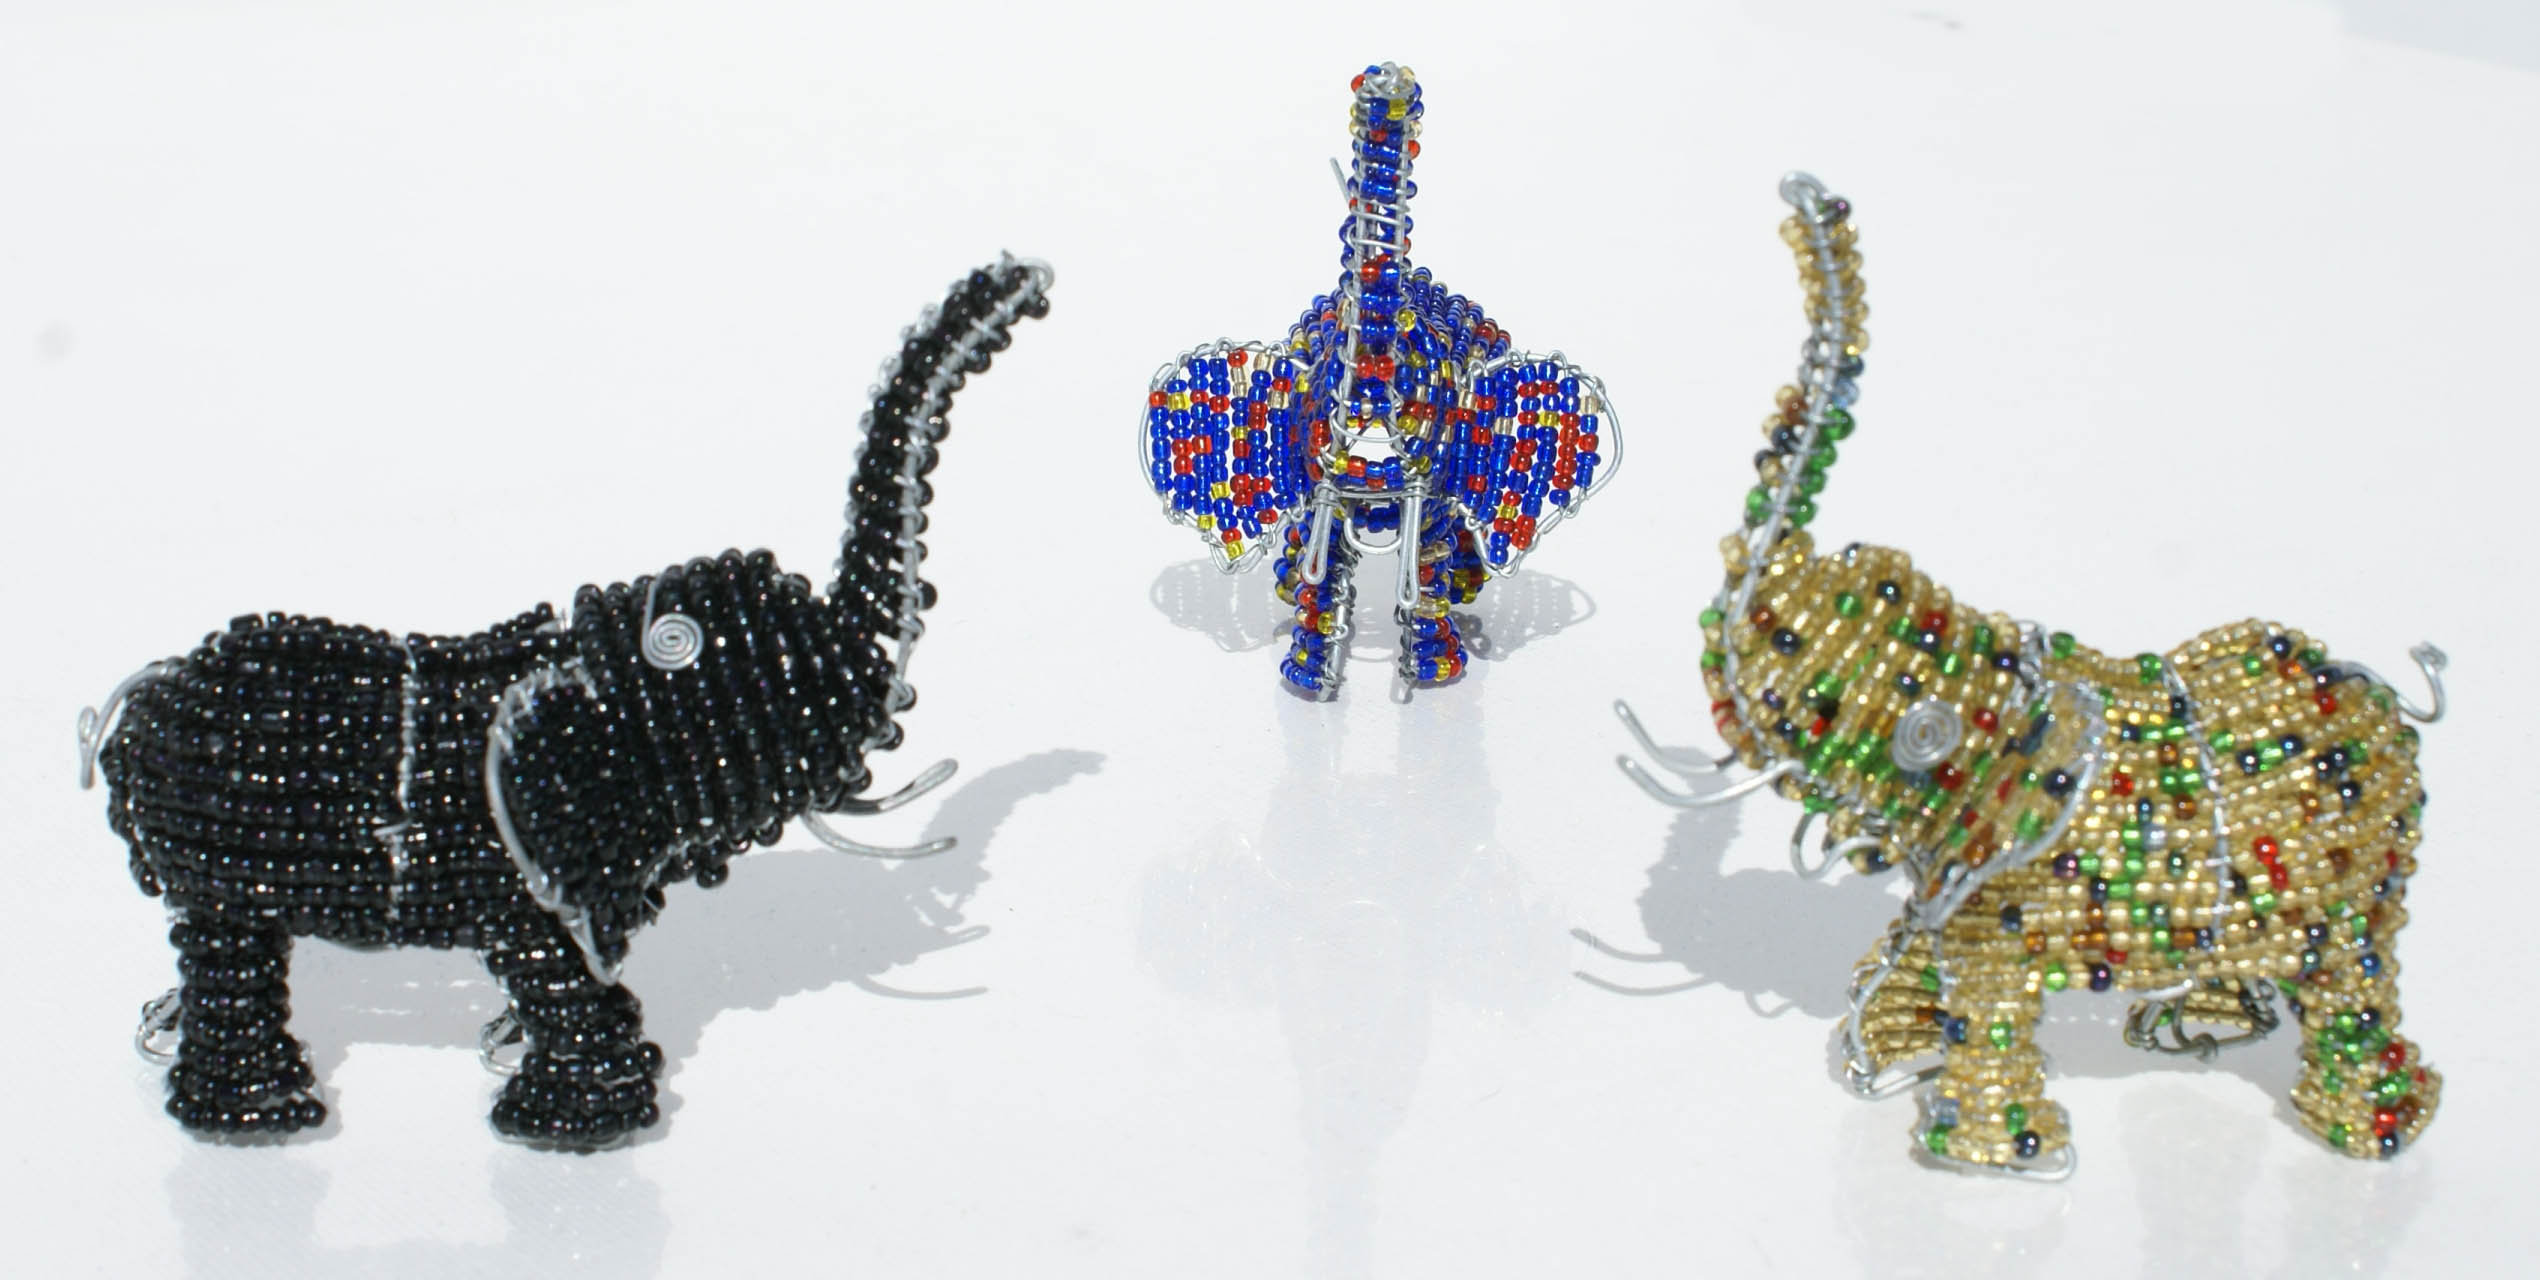 African elephant metal wire animal figurine one piece